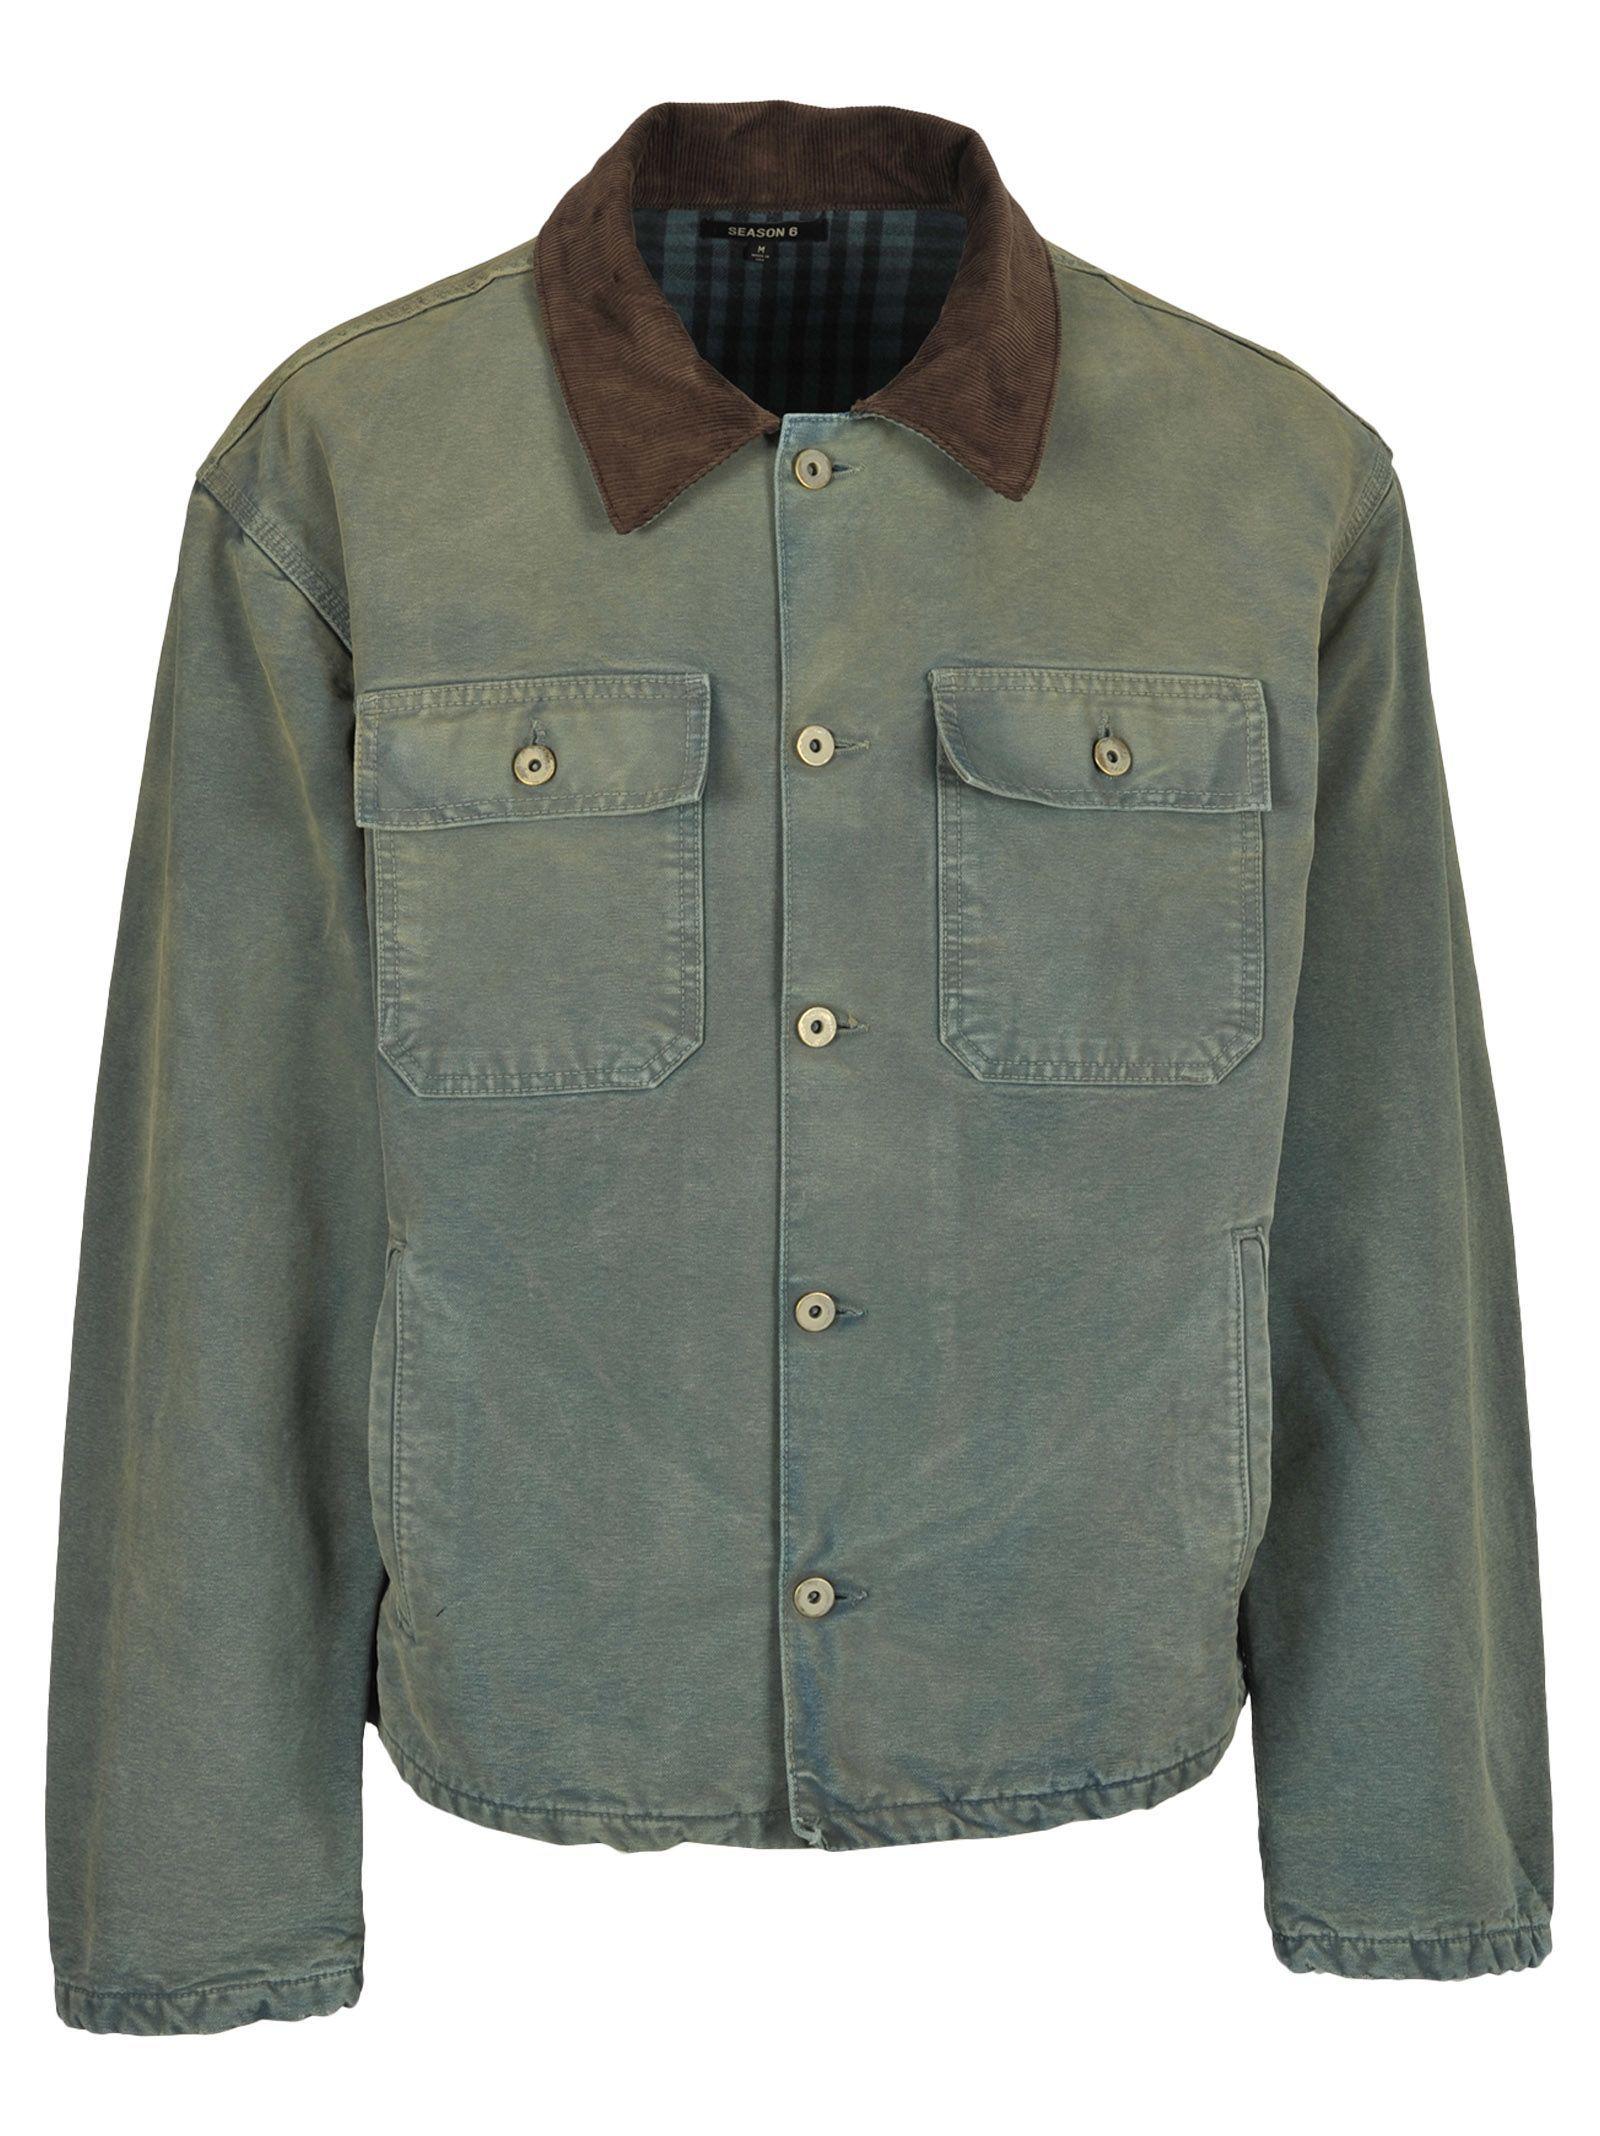 Yeezy Kanye West Canvas Jacket In Light Blue Modesens Jackets Canvas Jacket Yeezy